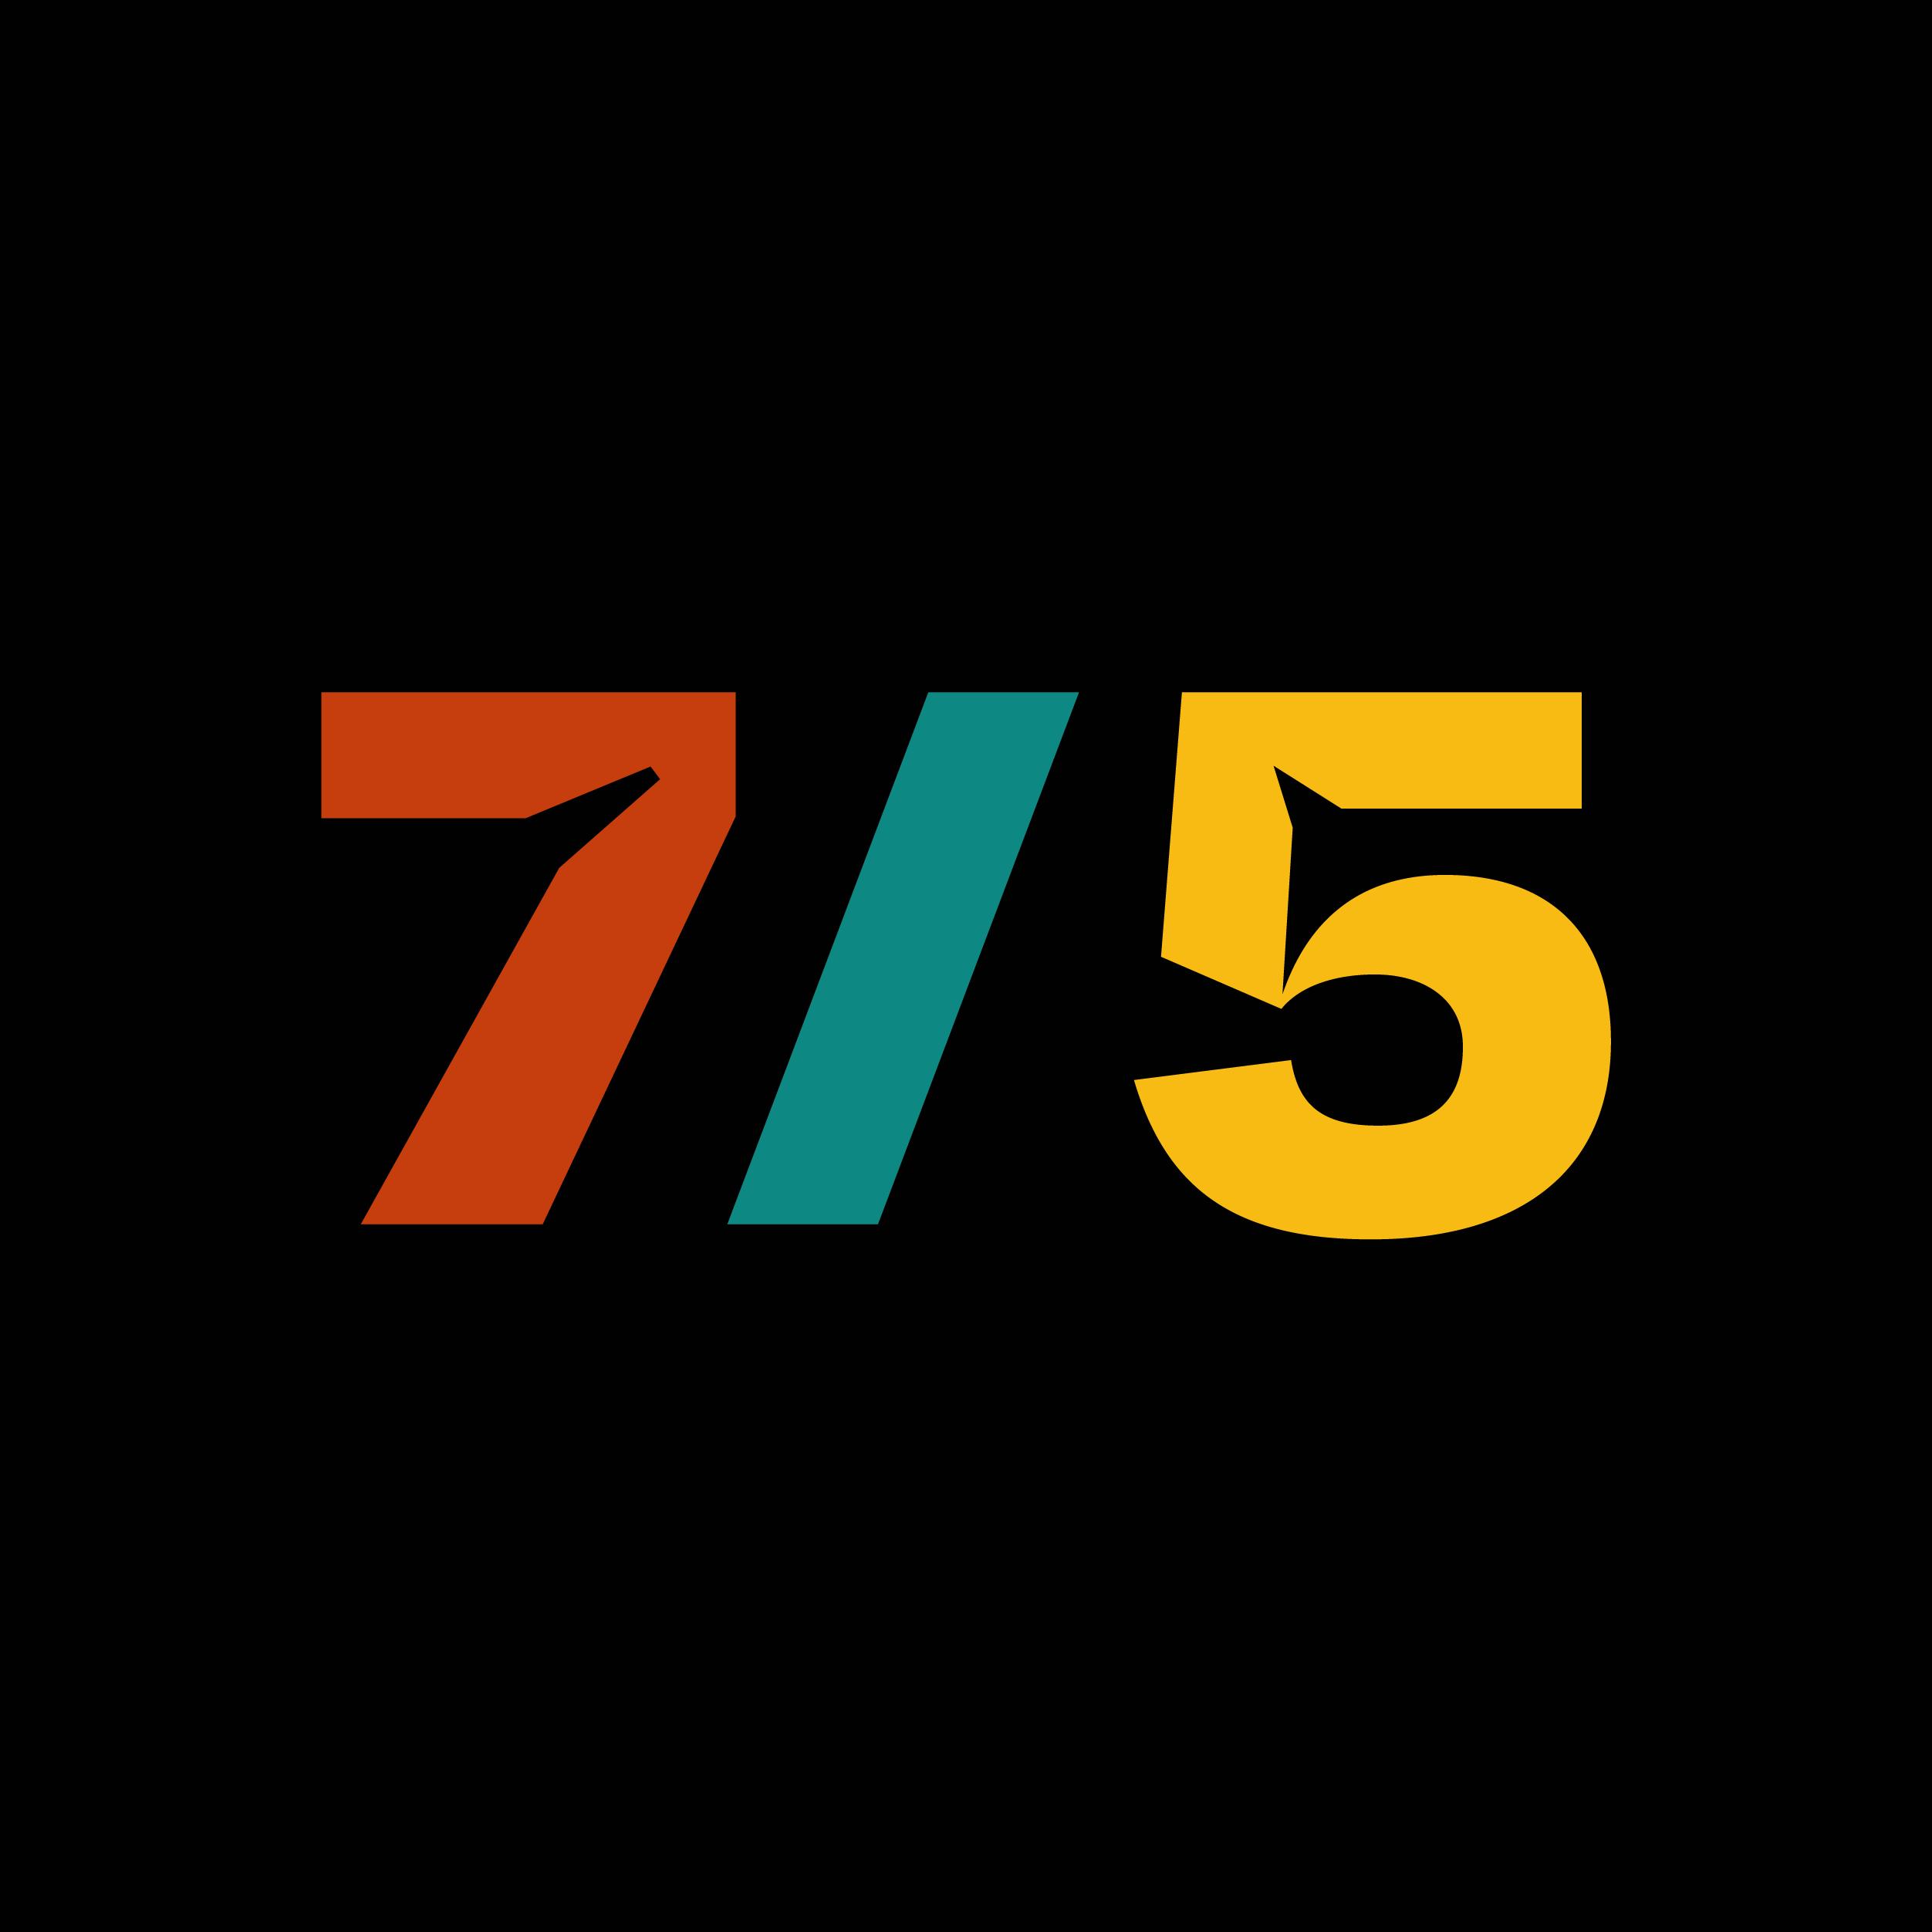 July Five logo